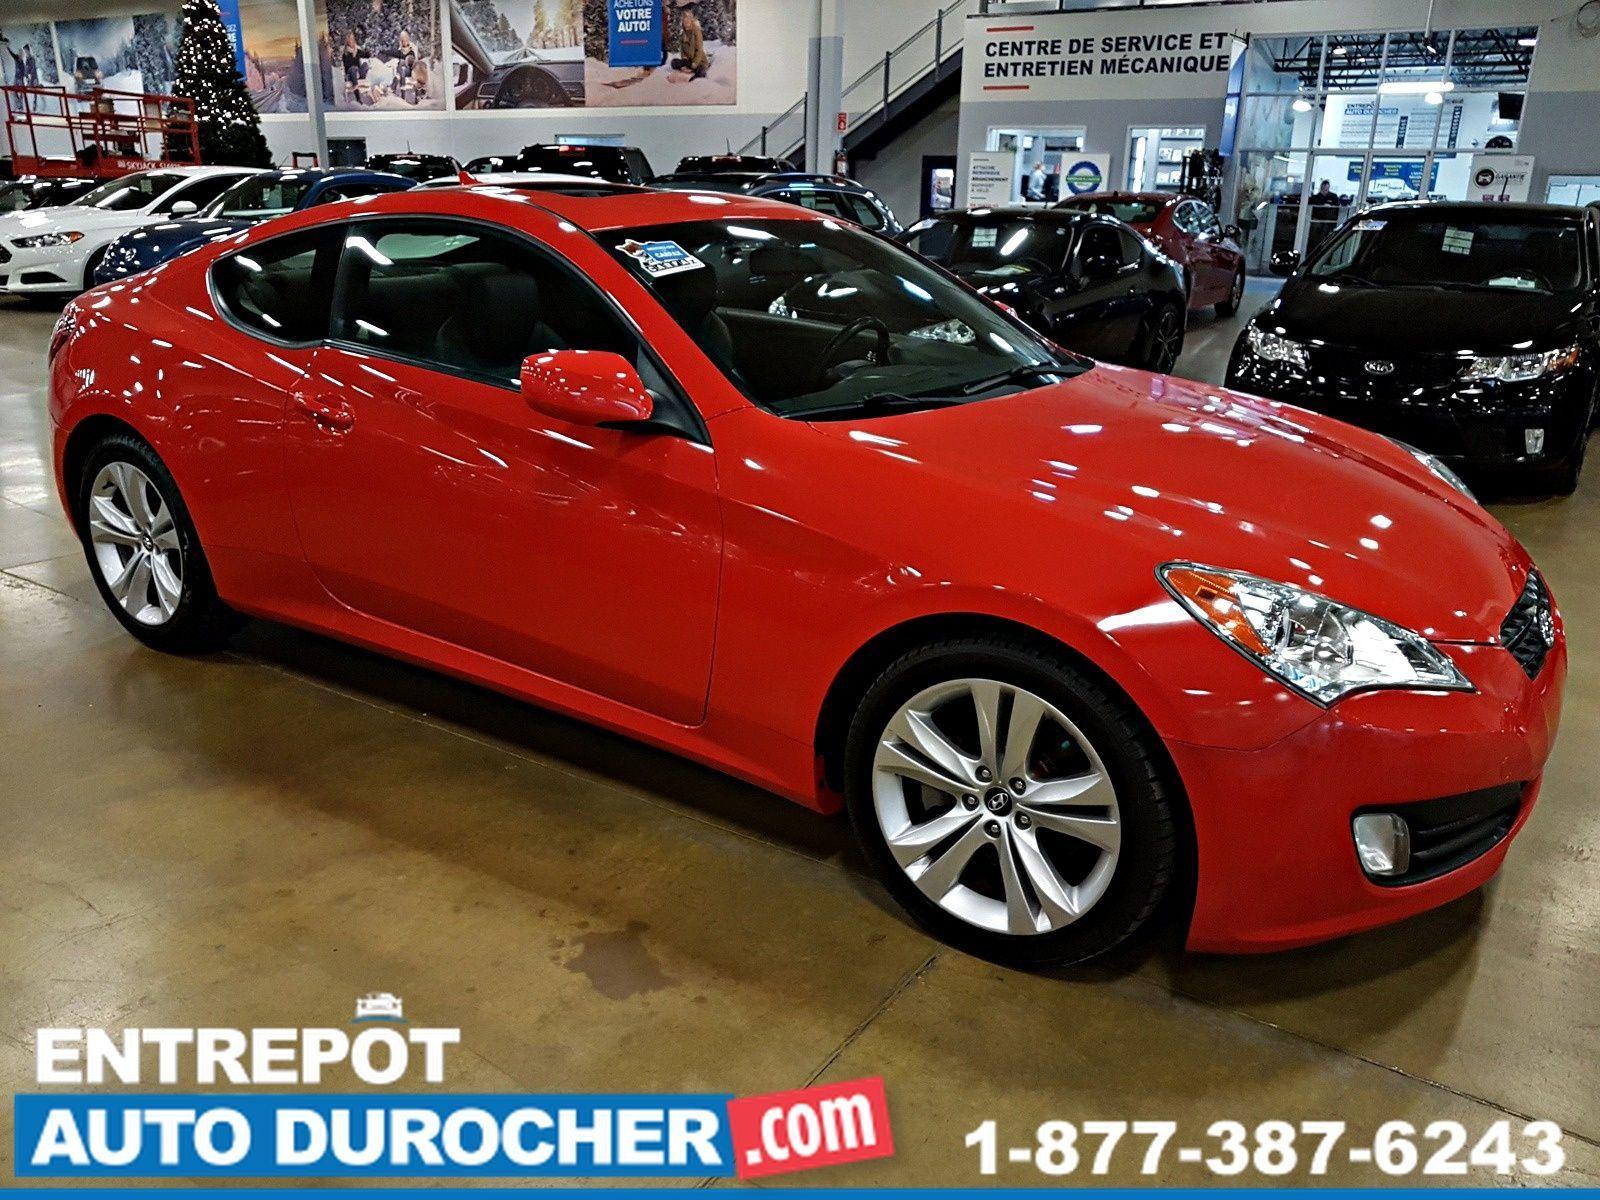 2012 Hyundai Genesis Coupe 2.0L - TOIT OUVRANT - AIR CLIMATISÉ - CUIR -  Heated